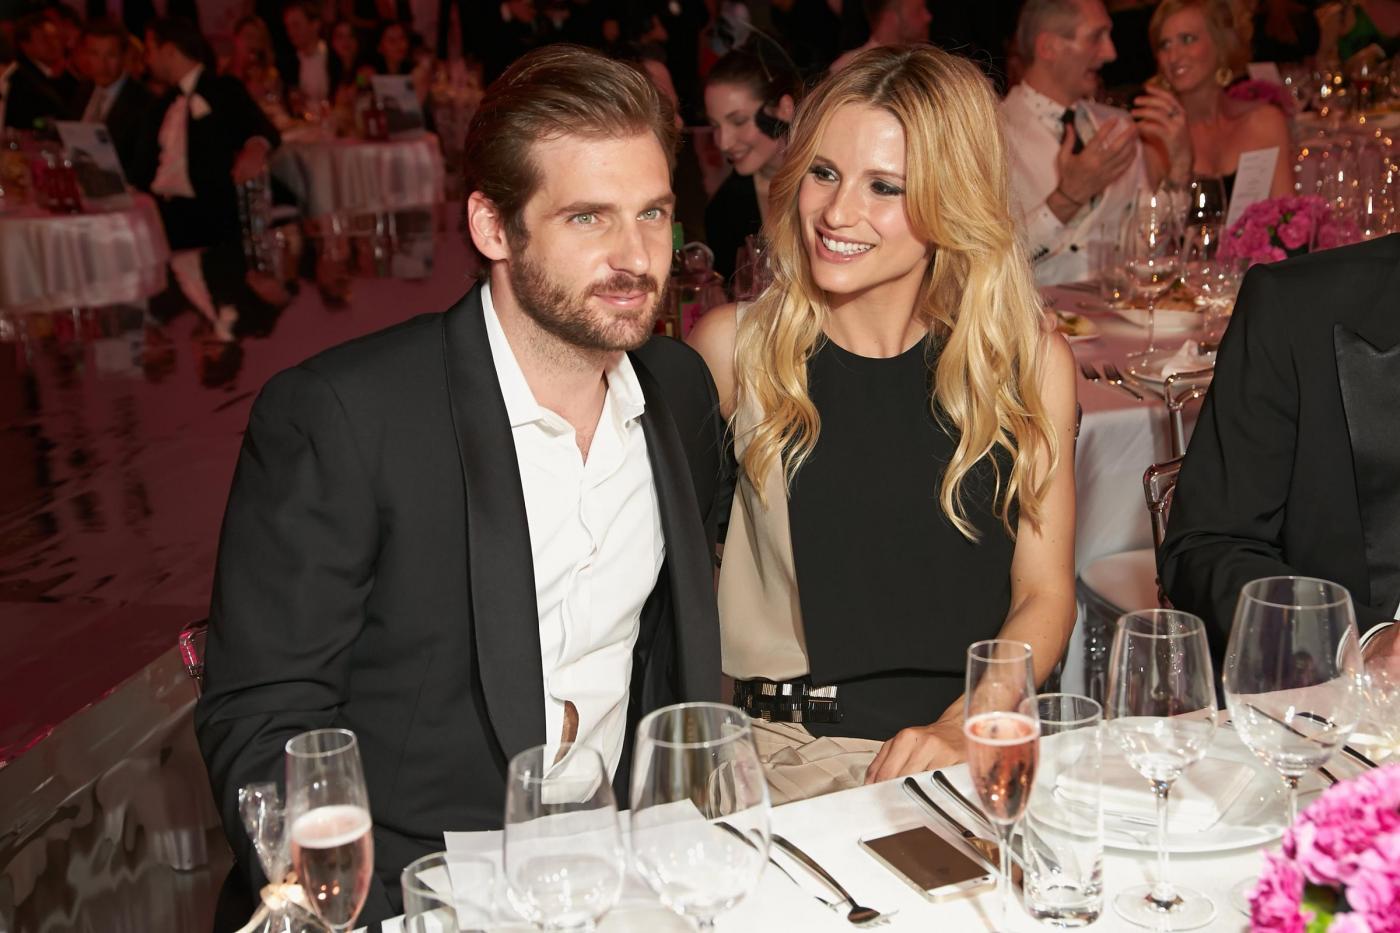 Michelle Hunziker e Tomaso Trussardi ai Vienna Awards02